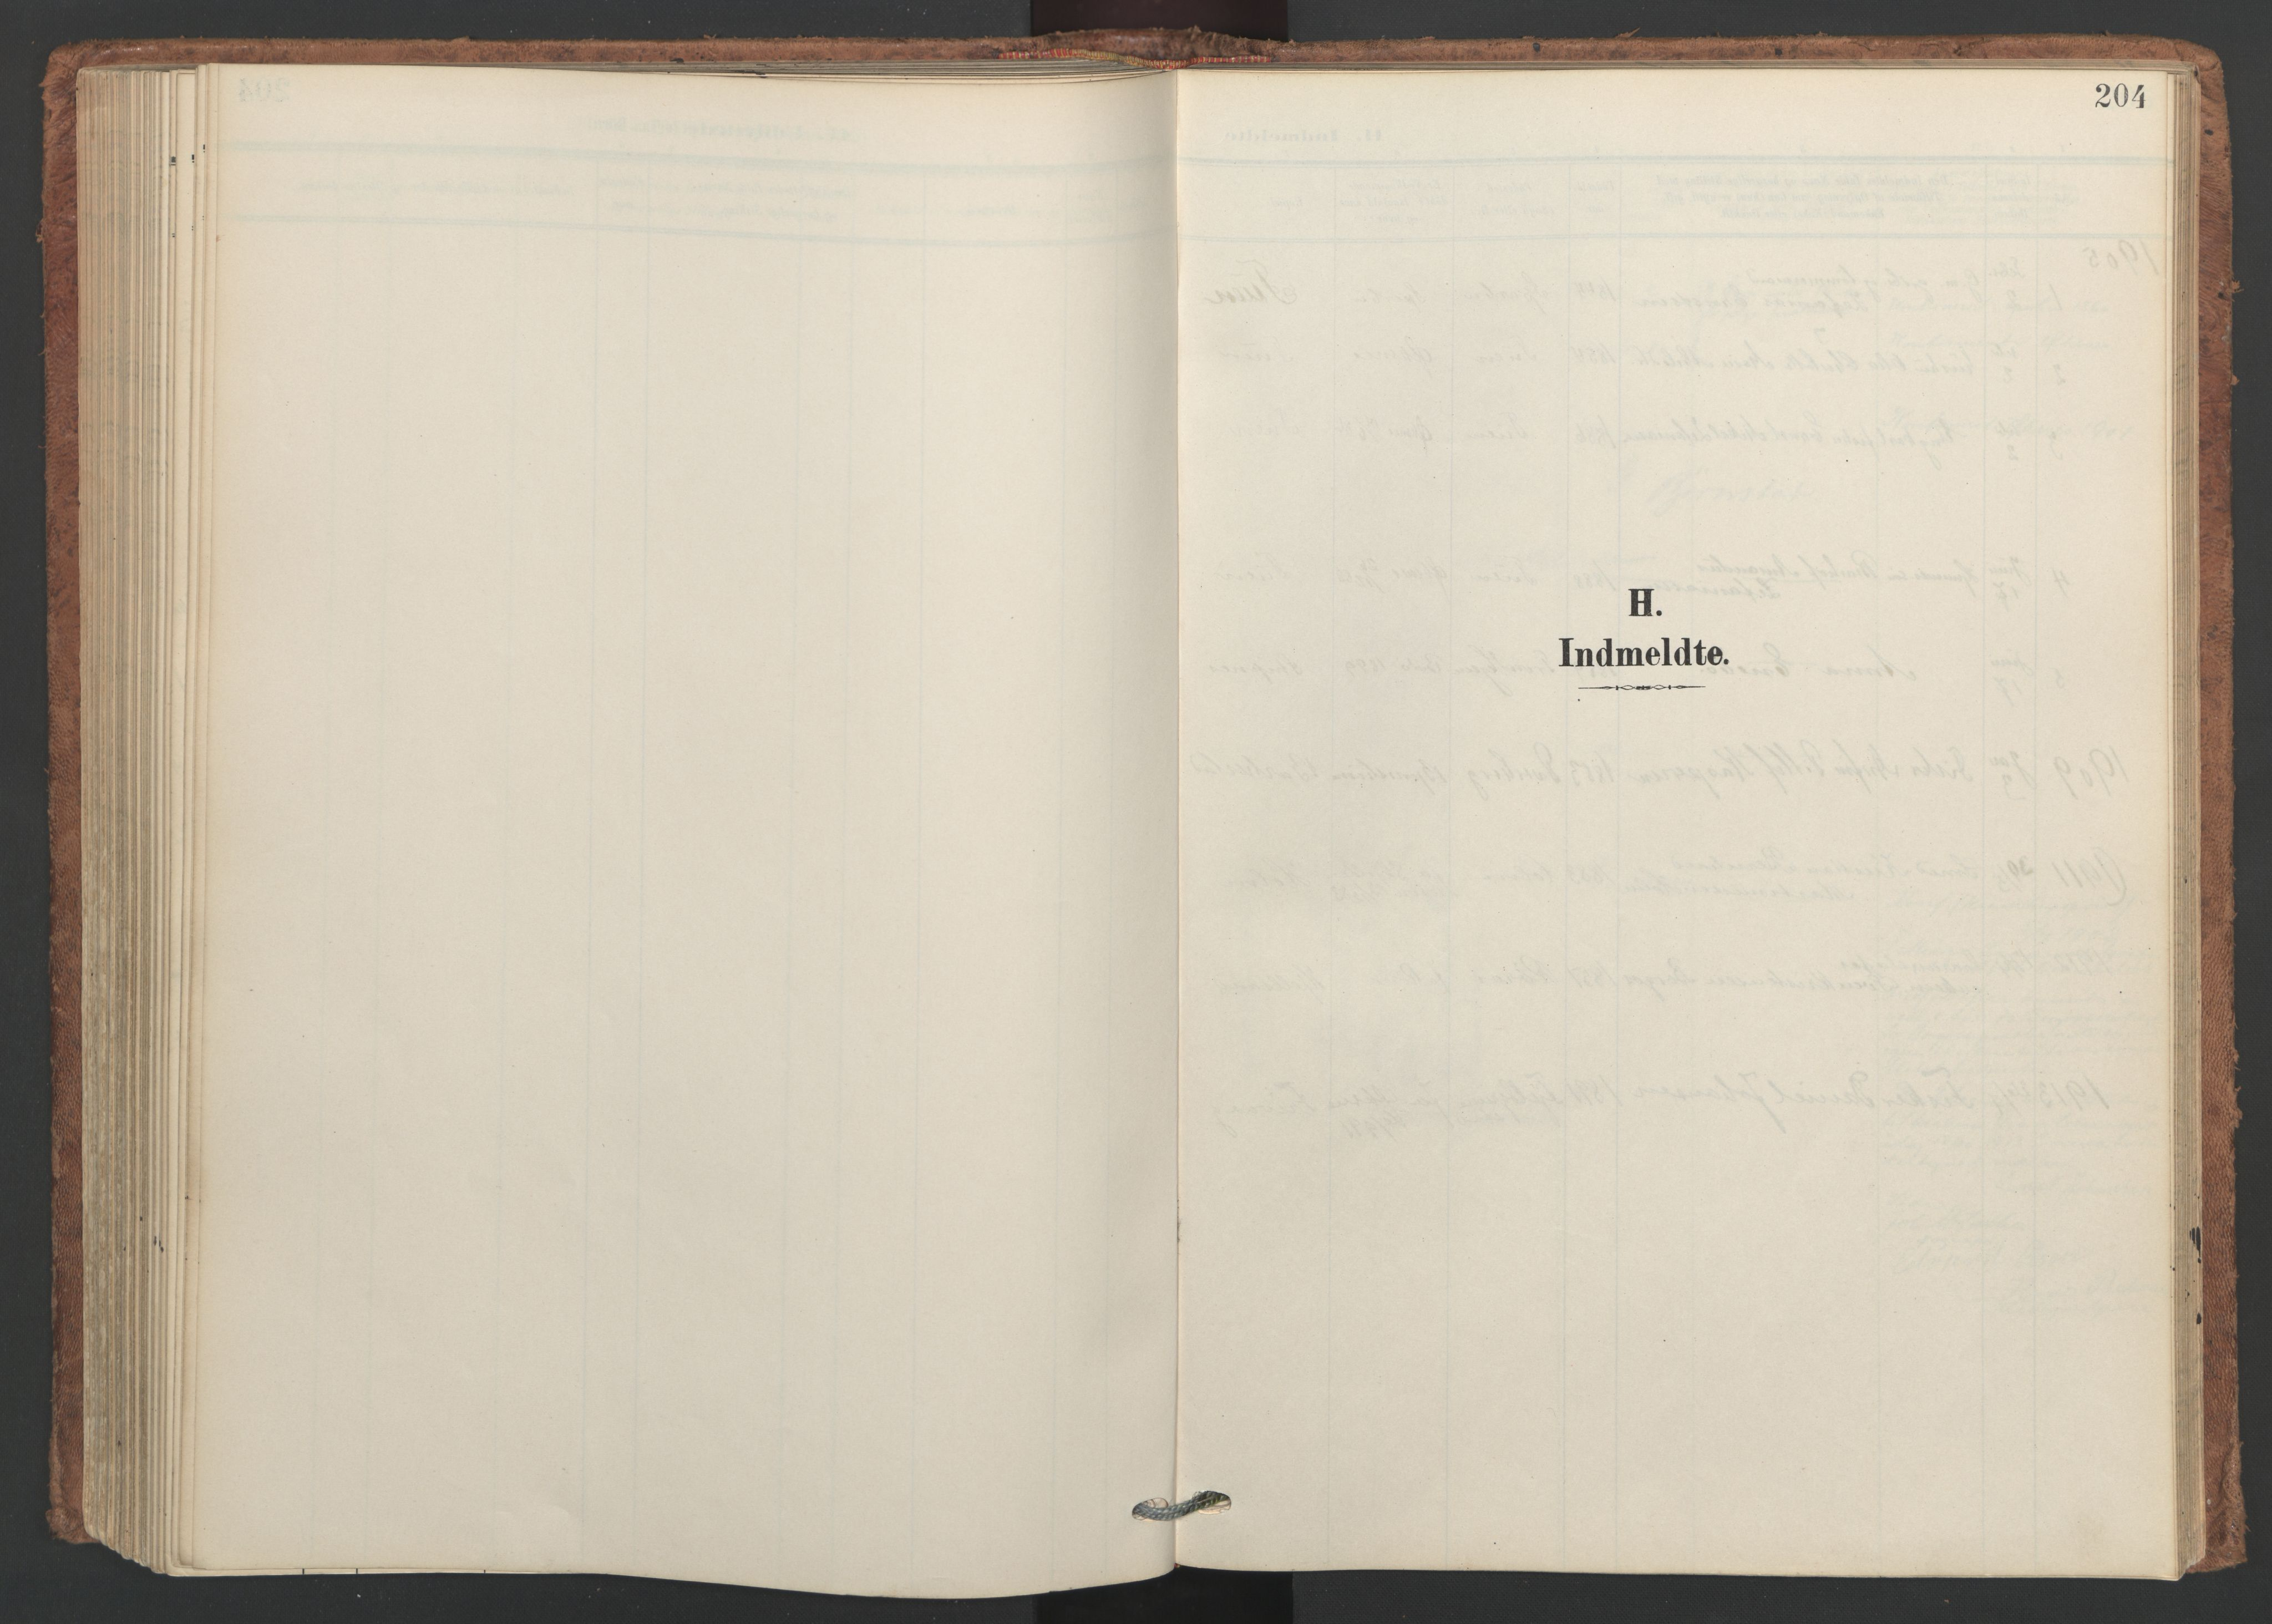 SAT, Ministerialprotokoller, klokkerbøker og fødselsregistre - Nordland, 893/L1339: Ministerialbok nr. 893A11, 1904-1914, s. 204